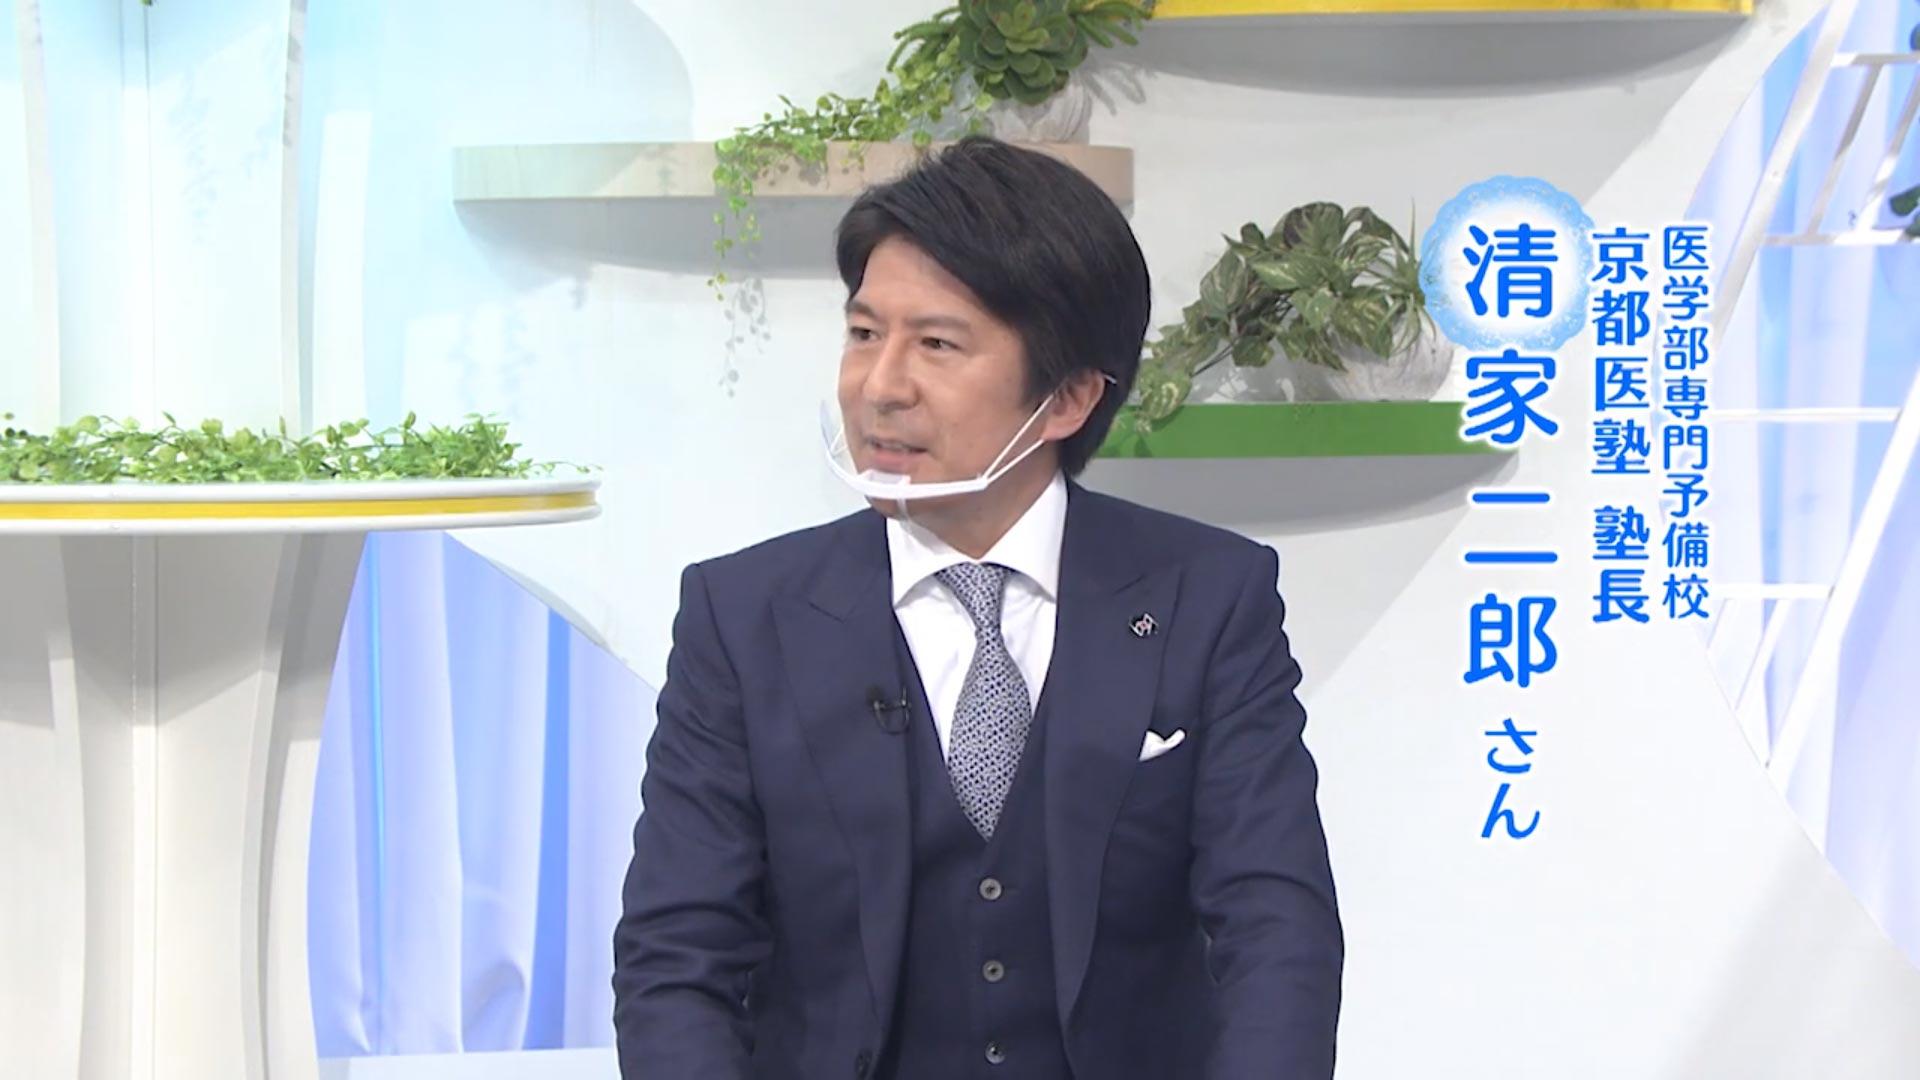 RKB「池尻和佳子のトコワカ」2021年3月6日放送